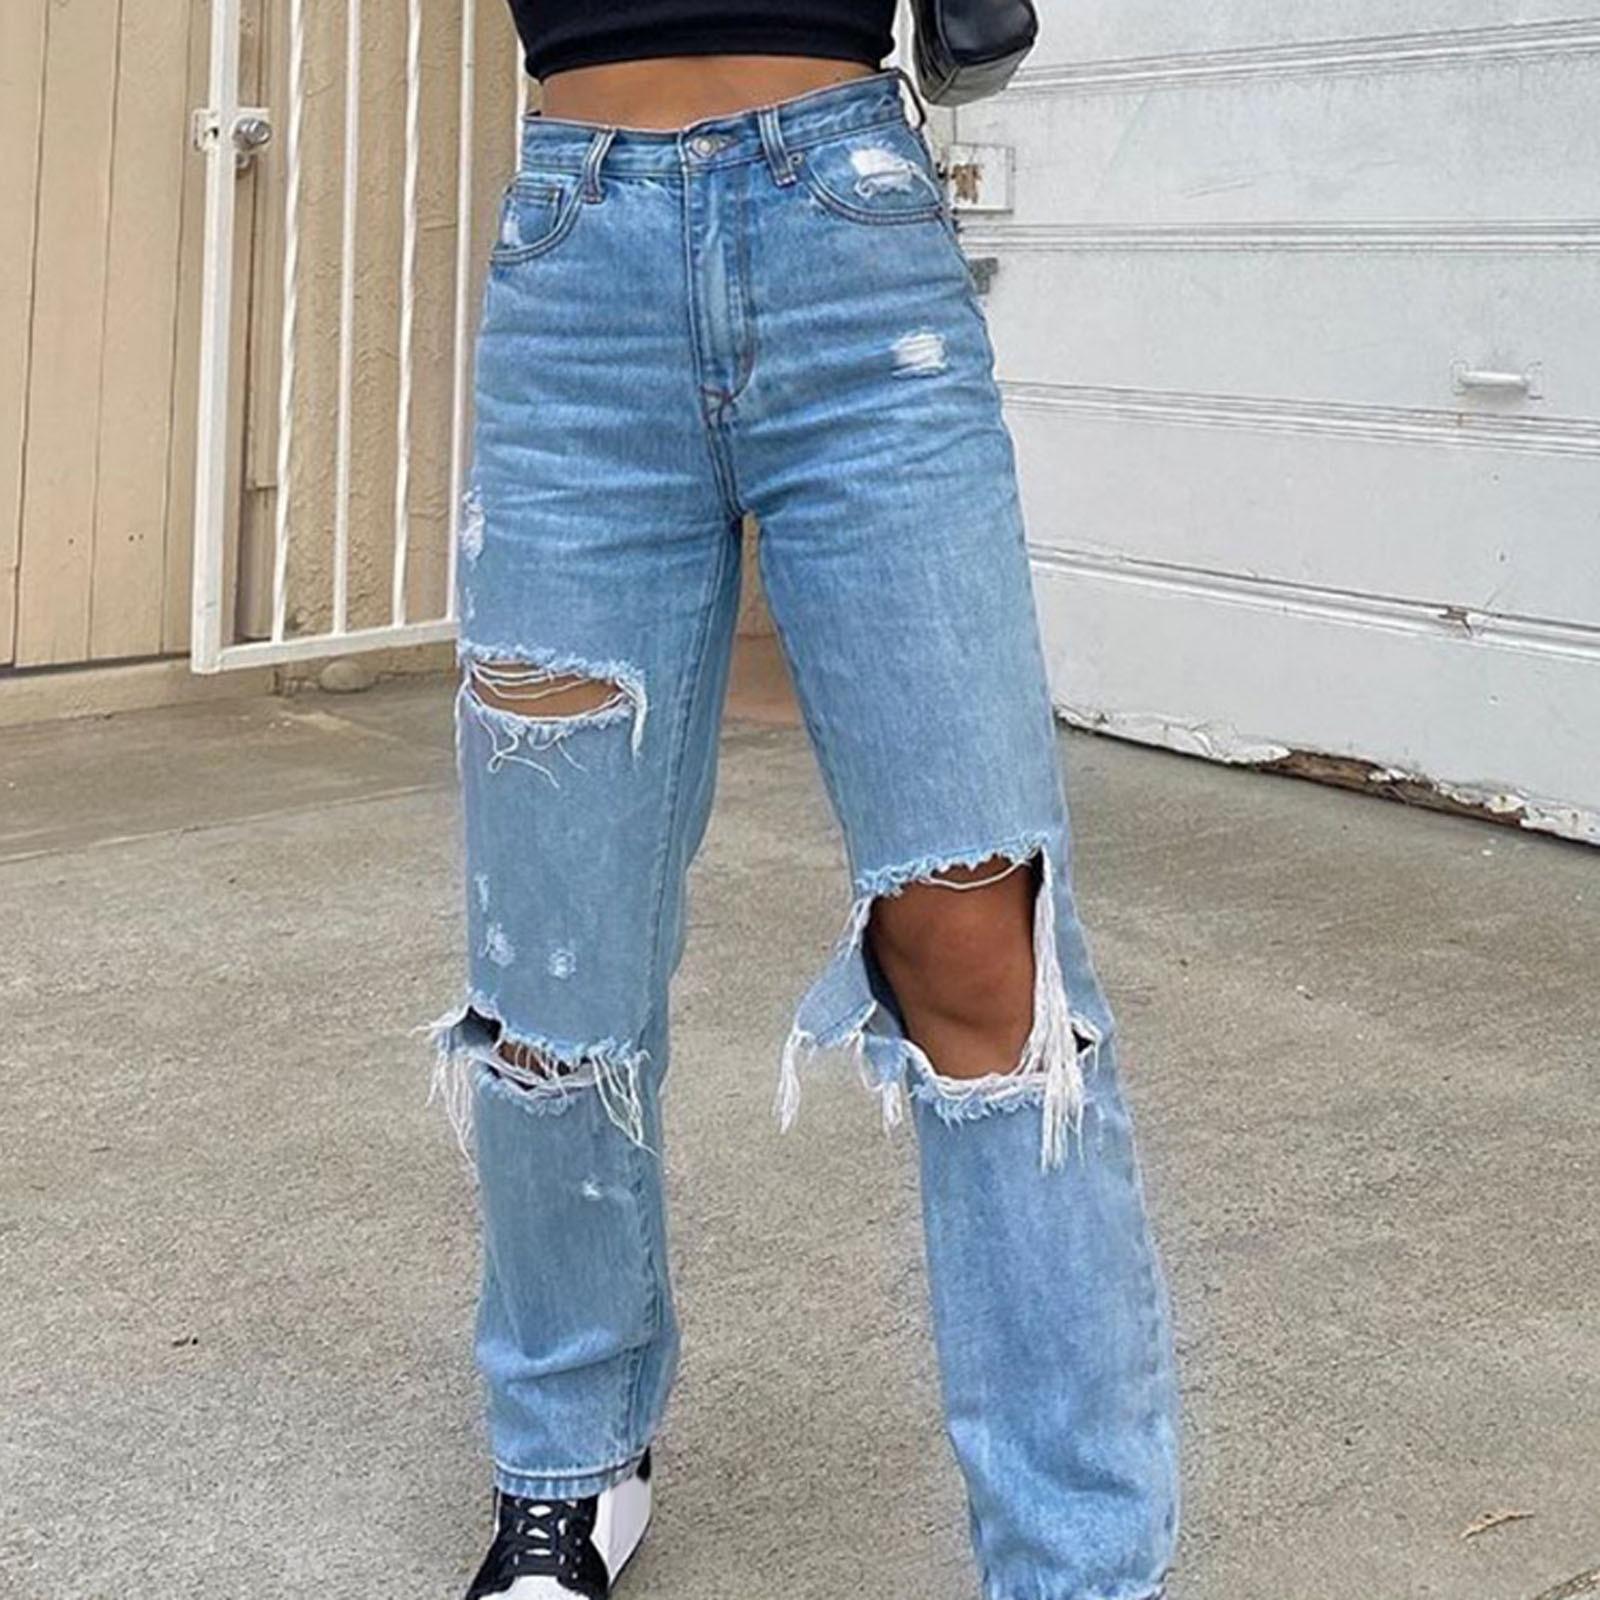 Women Button High Waist Pocket Elastic Hole Jeans Ladies High Waist Ripped Stretch Loose Jeans Trousers Loose Denim Pants недорого